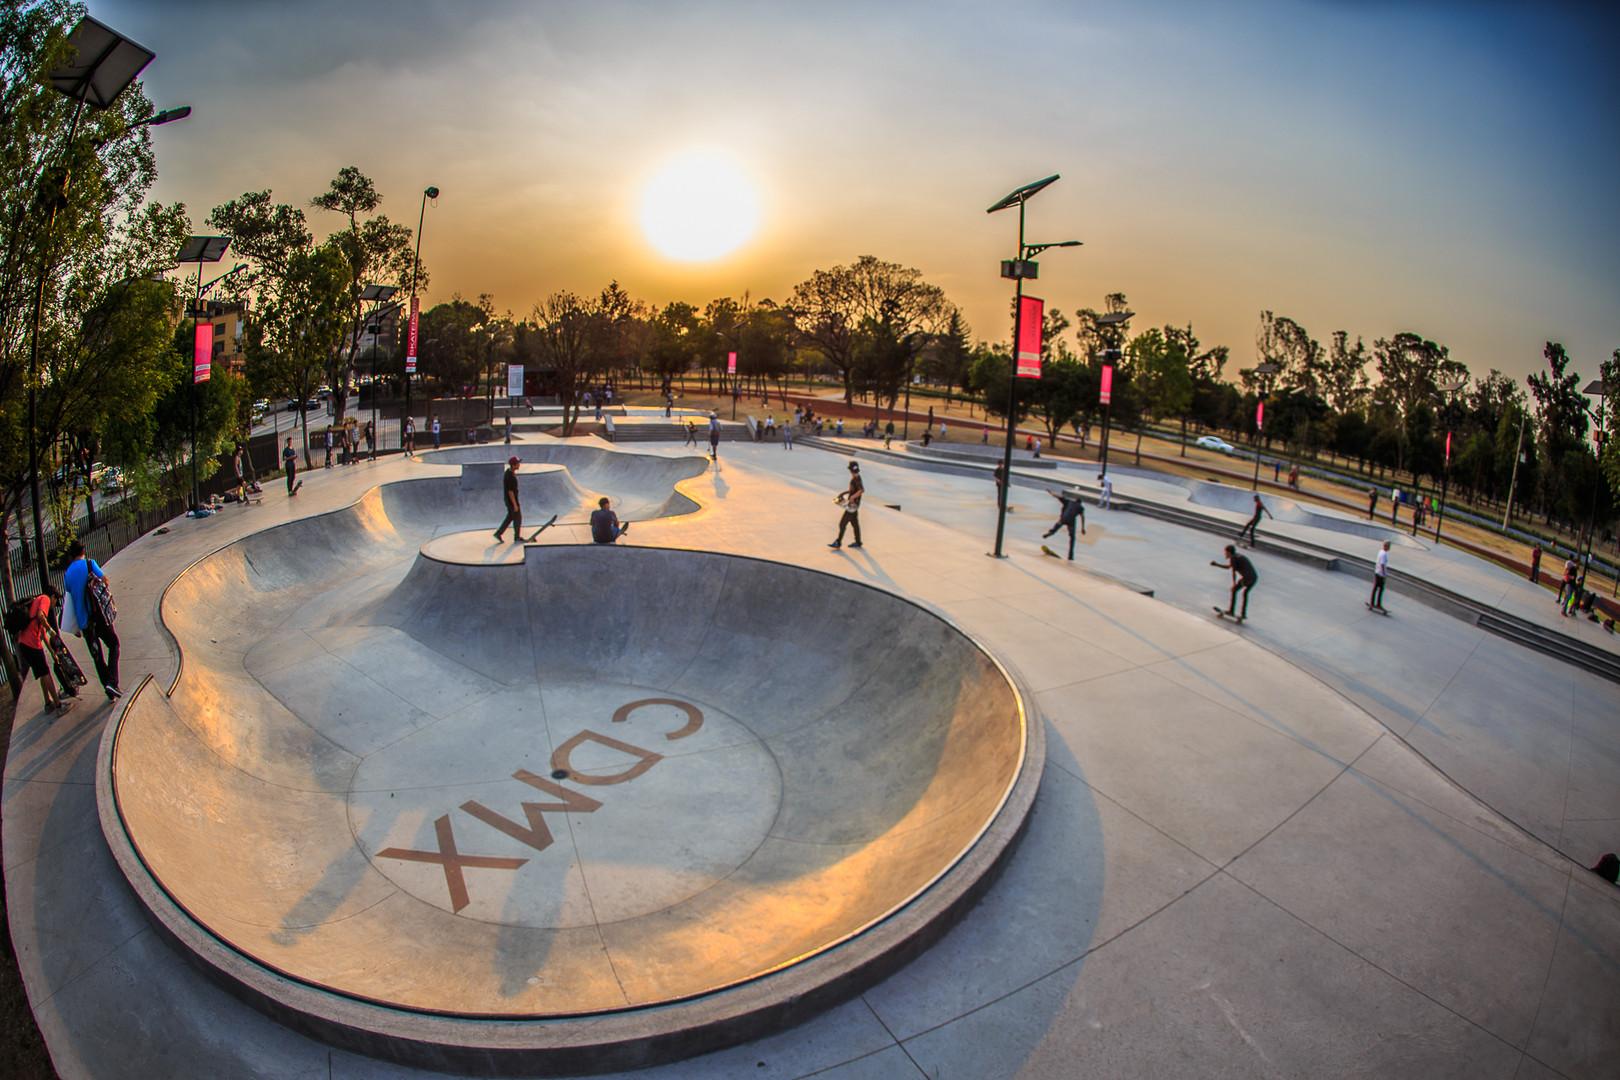 Skate Park, Constituyentes, Bosque de Chapultepec 2ª sección